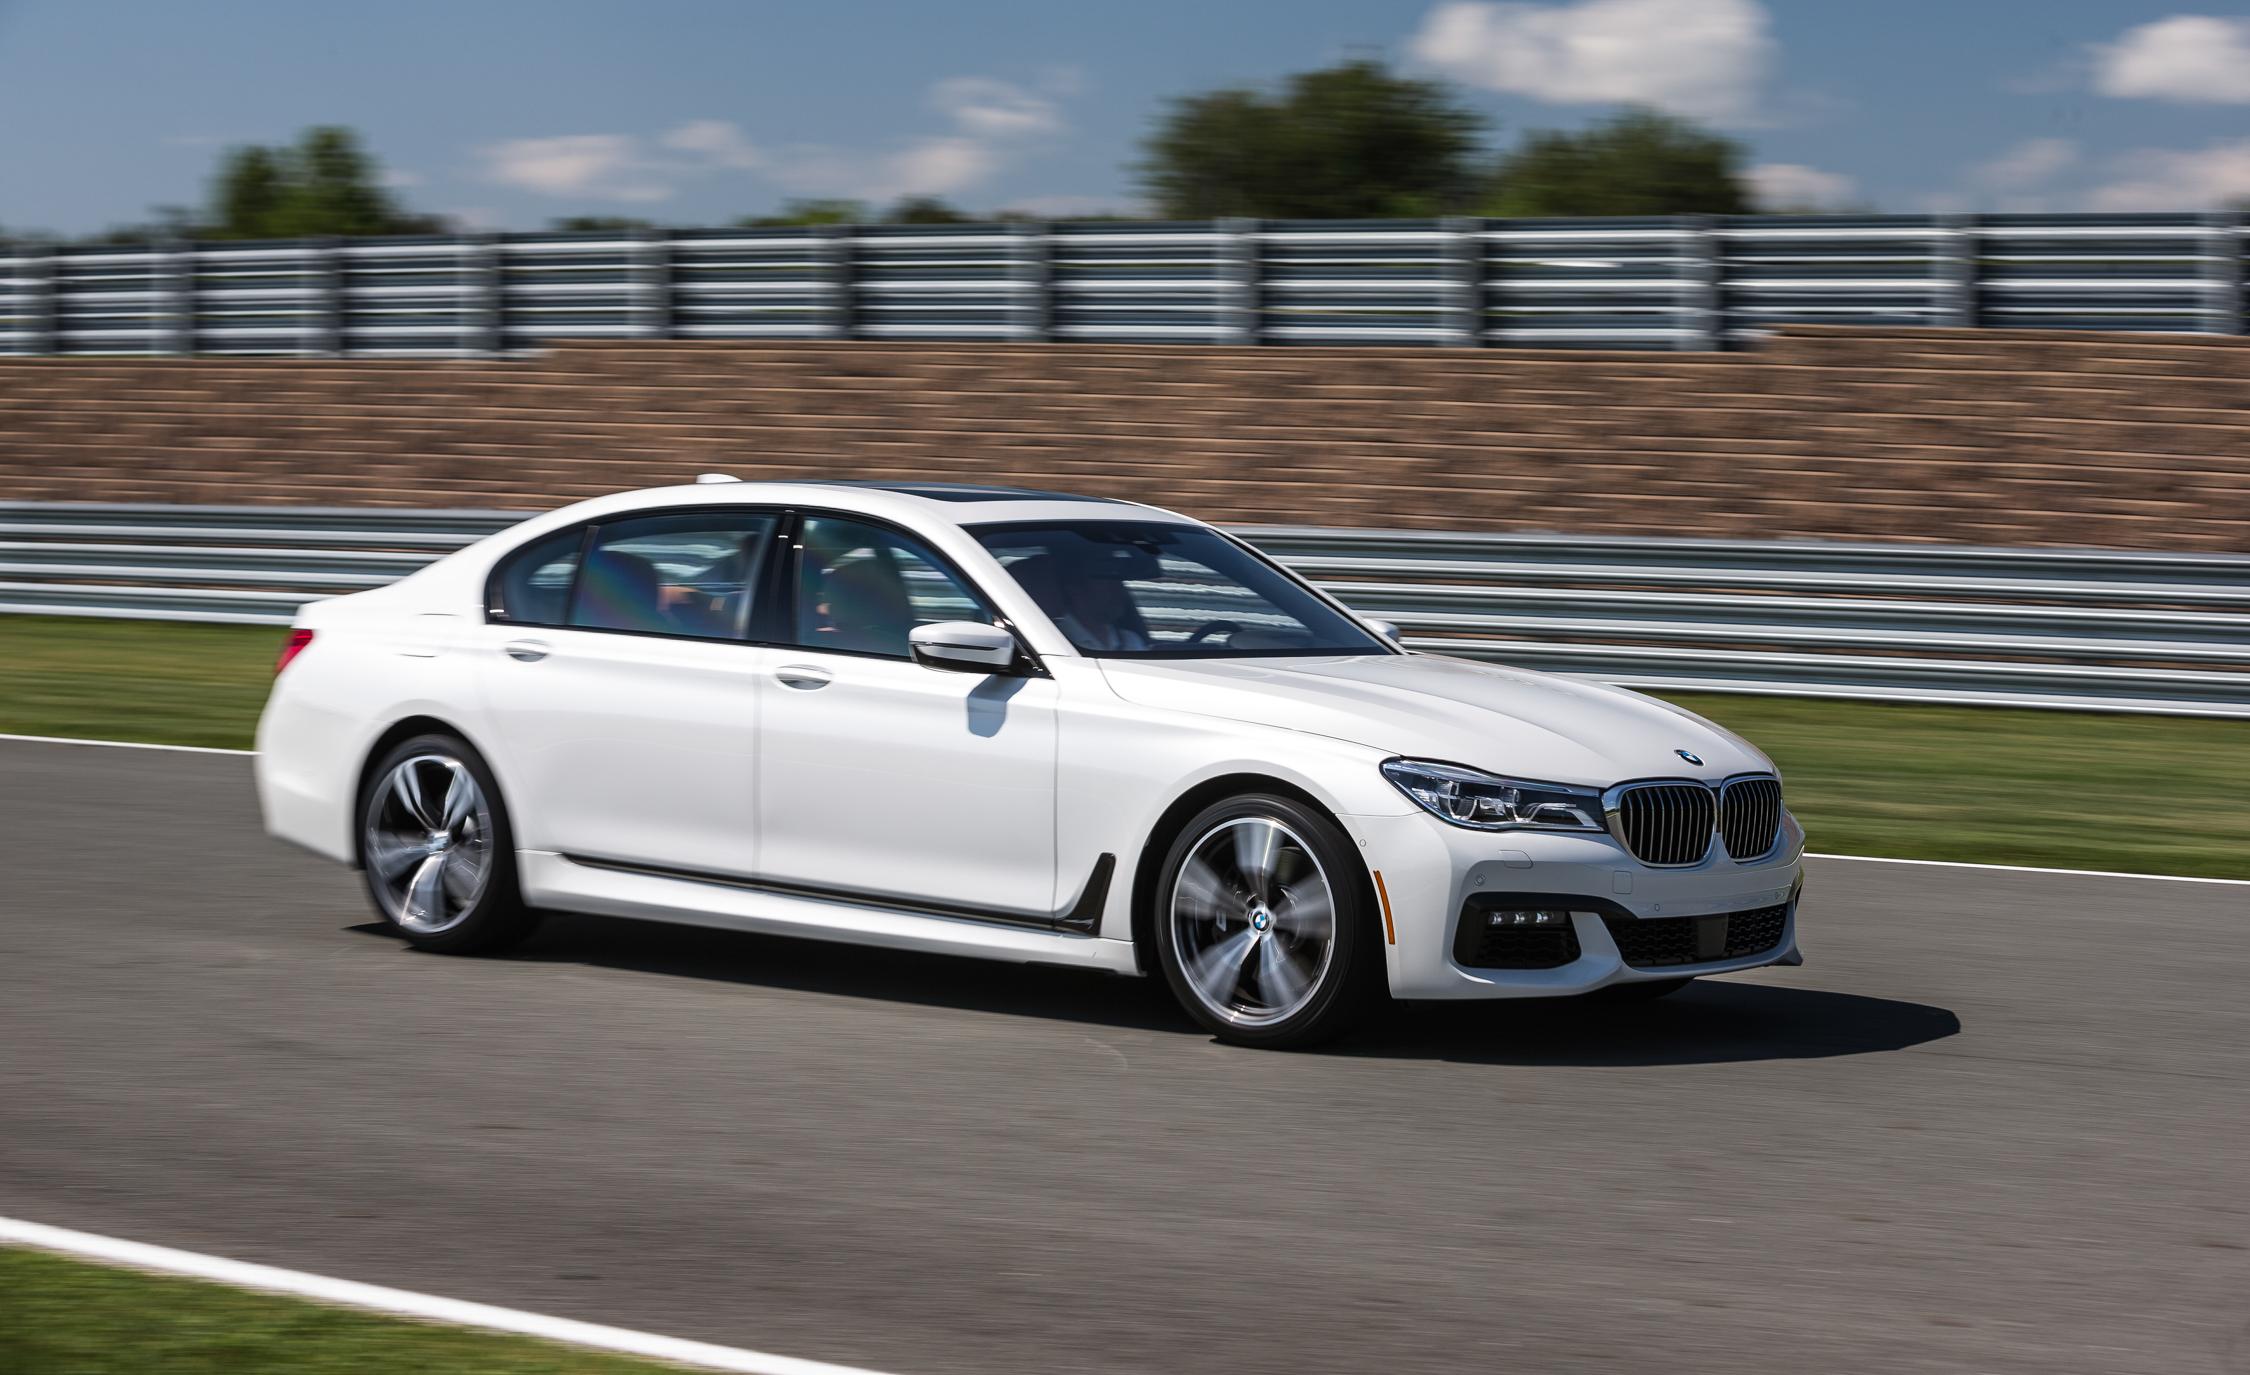 2016 BMW 750i xDrive White Test Drive